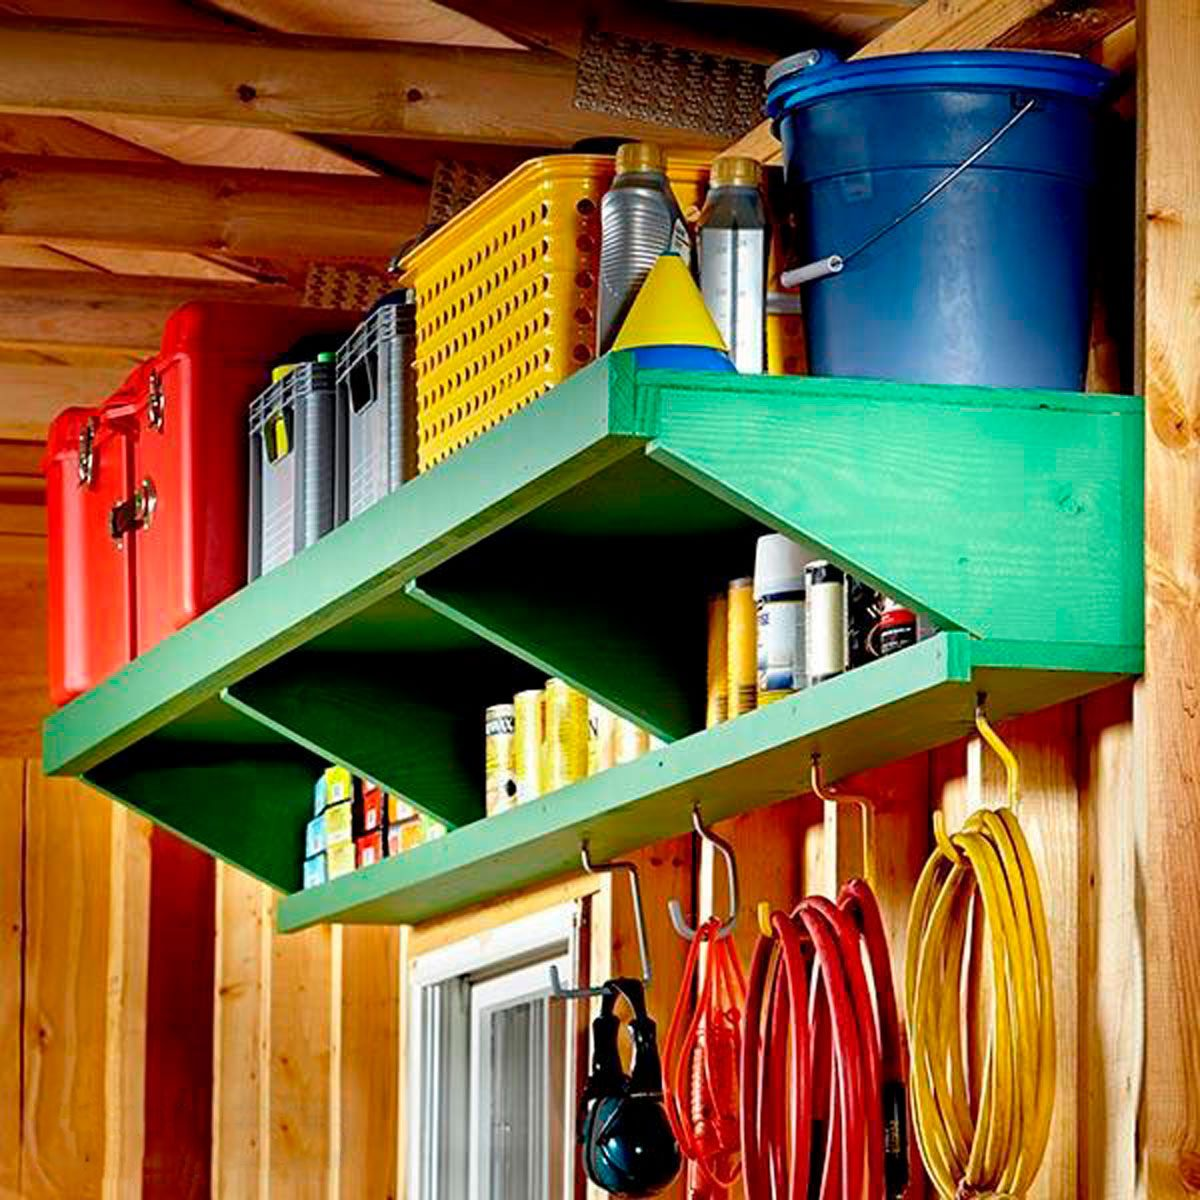 double decker storage shelves